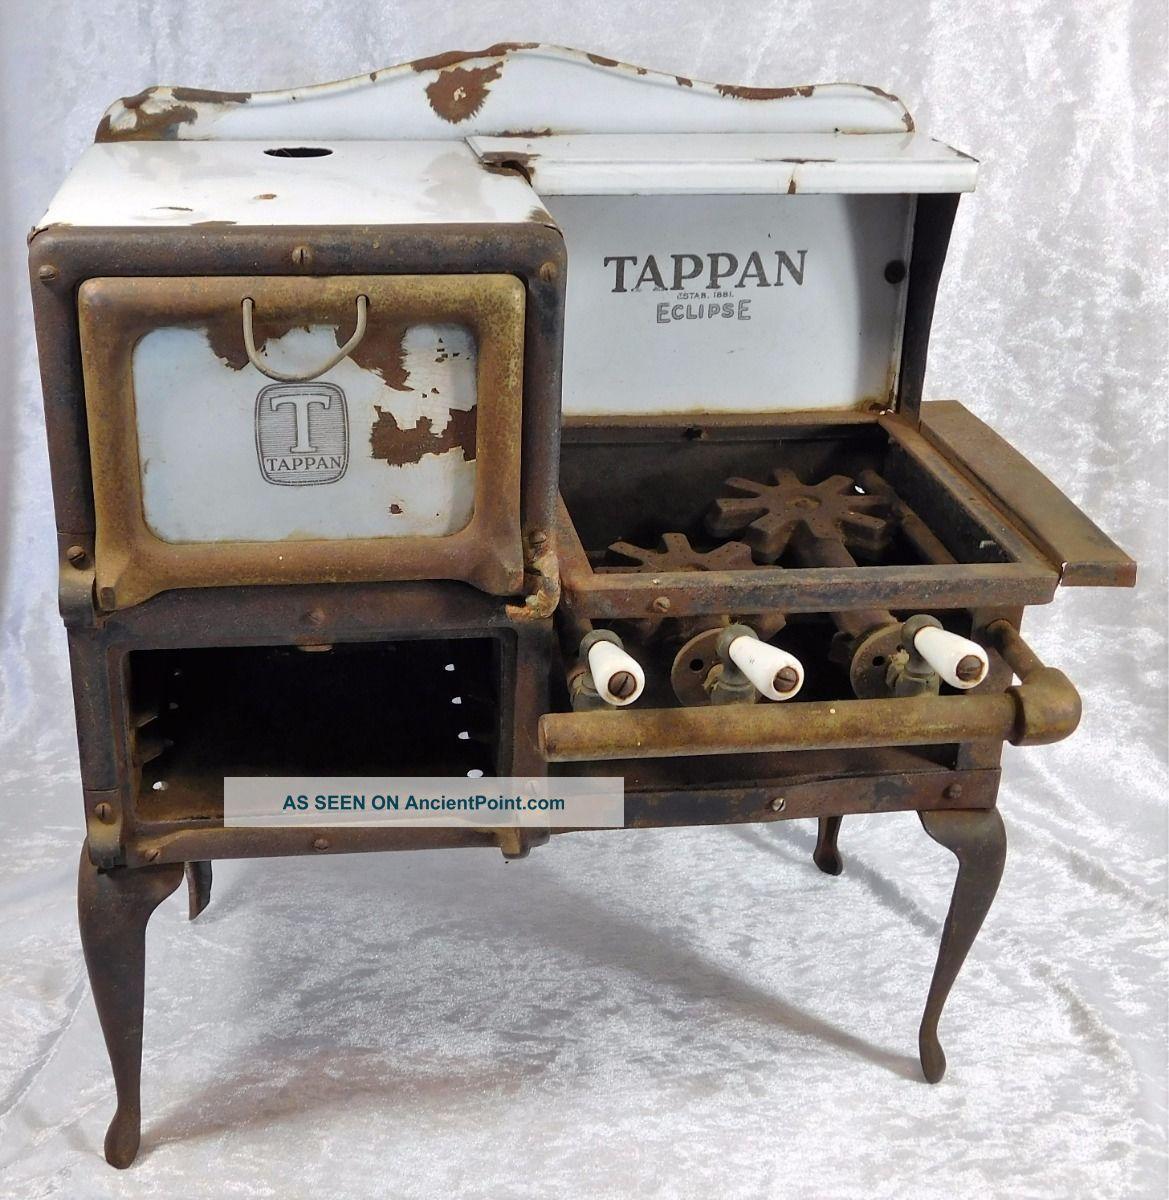 Atq Tappan 1881 Eclipse Stove Oven Salesman Sample Promo Model Minature Stoves photo